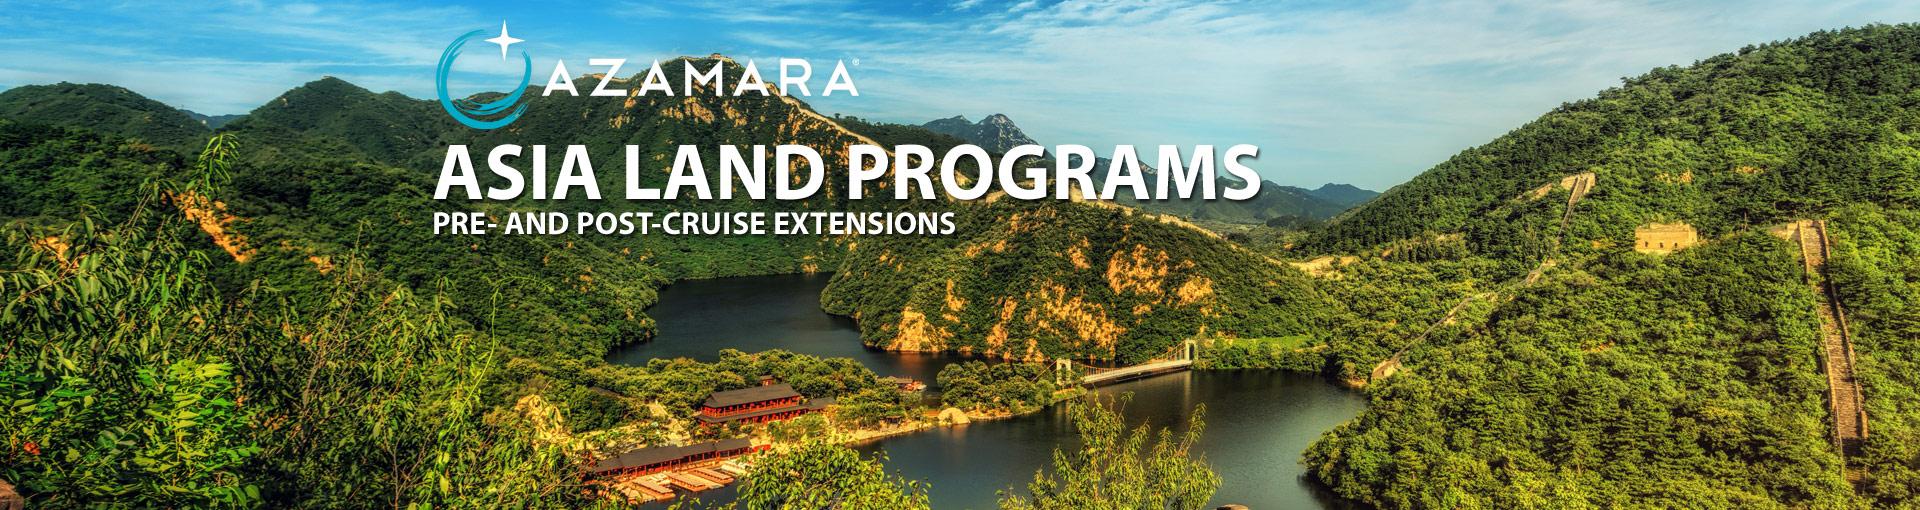 Azamara Asia Land Programs